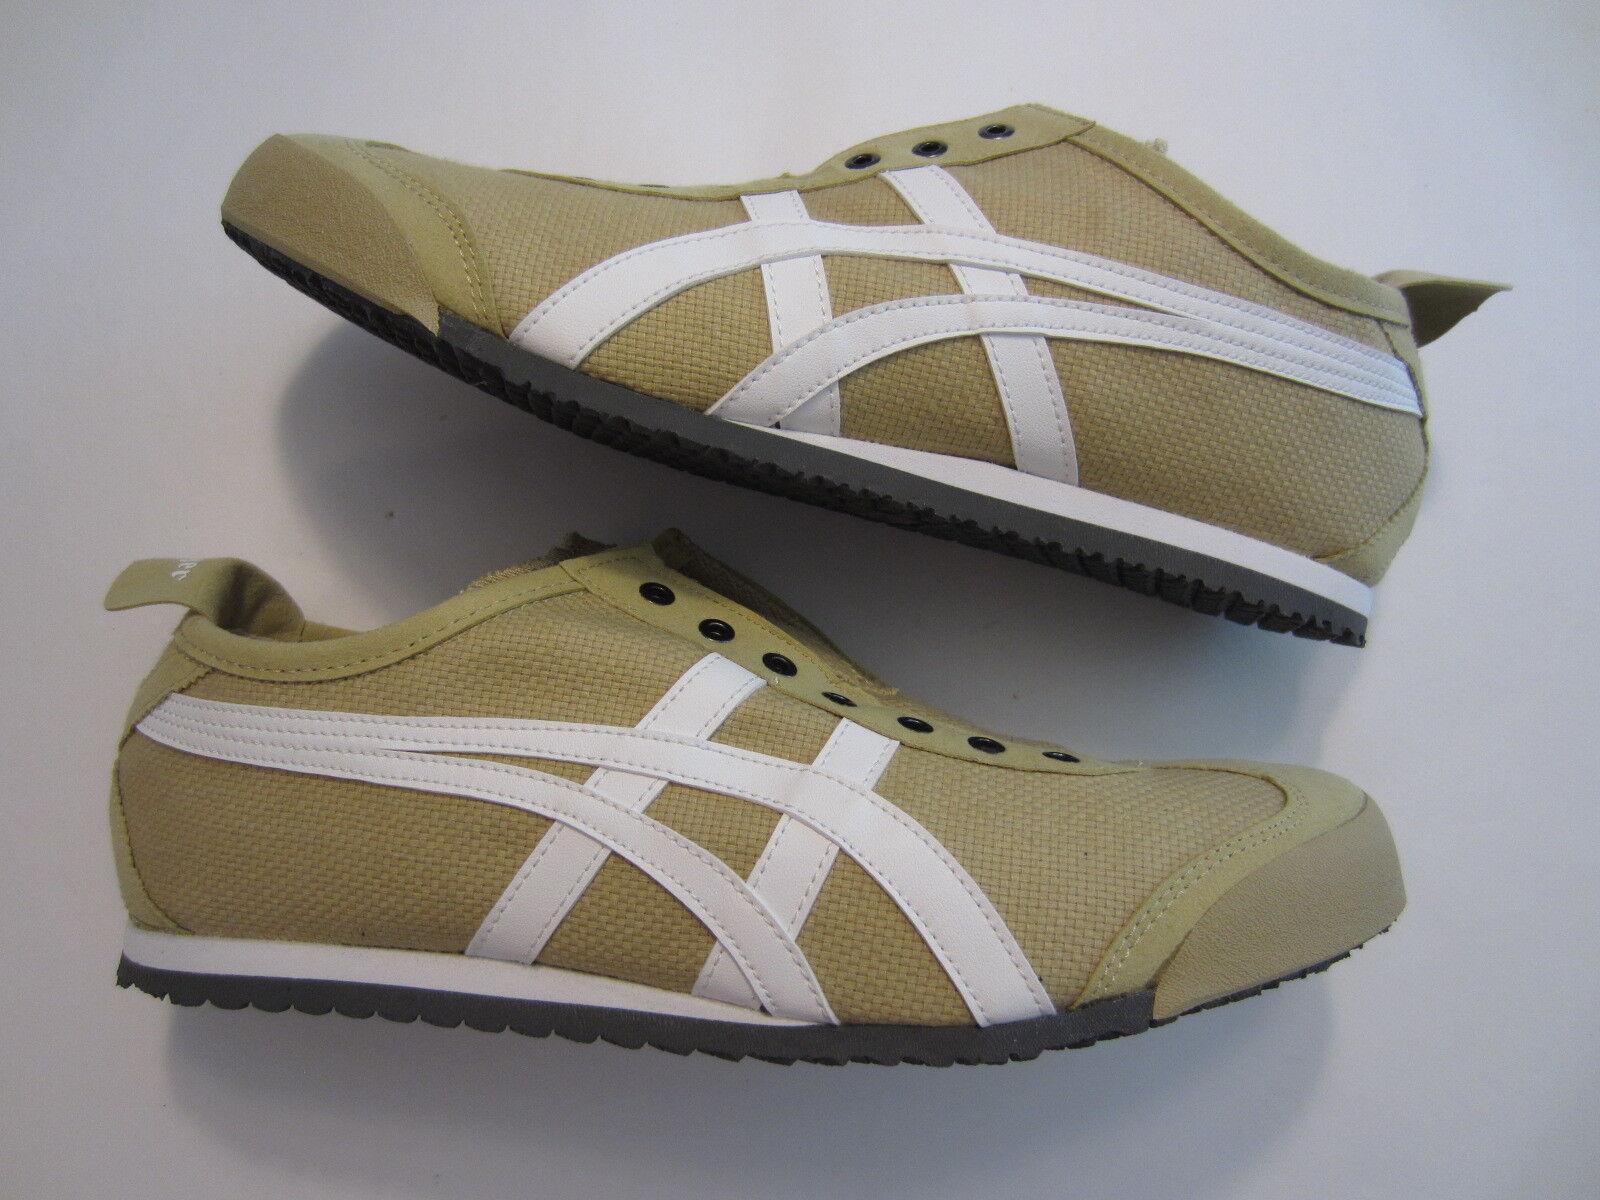 NEW Asics Onitsuka Tiger Mexico 66 Slip-On mens shoe sneaker taos taupe 7.5 US